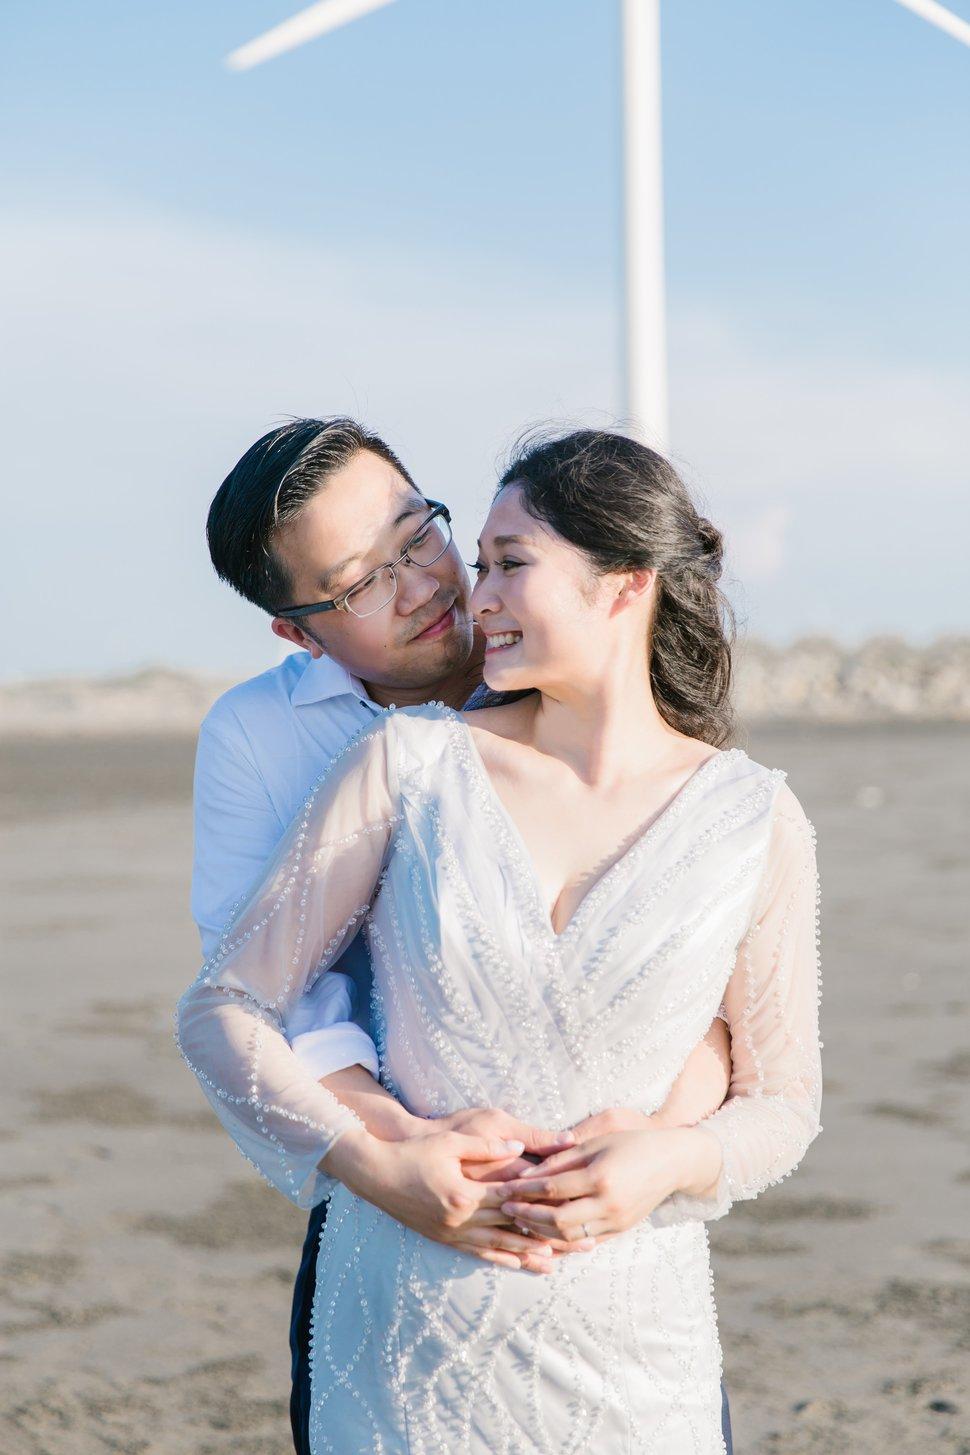 AG美式婚紗 - AG自助婚紗- 美式婚禮攝影-美式婚禮紀錄-婚禮紀實- 海外婚紗 -婚紗拍攝-自主婚紗-女婚攝-Amazing Grace攝影美學-台中自助婚紗推薦-自然清新婚紗 - Amazing Grace Studio《結婚吧》